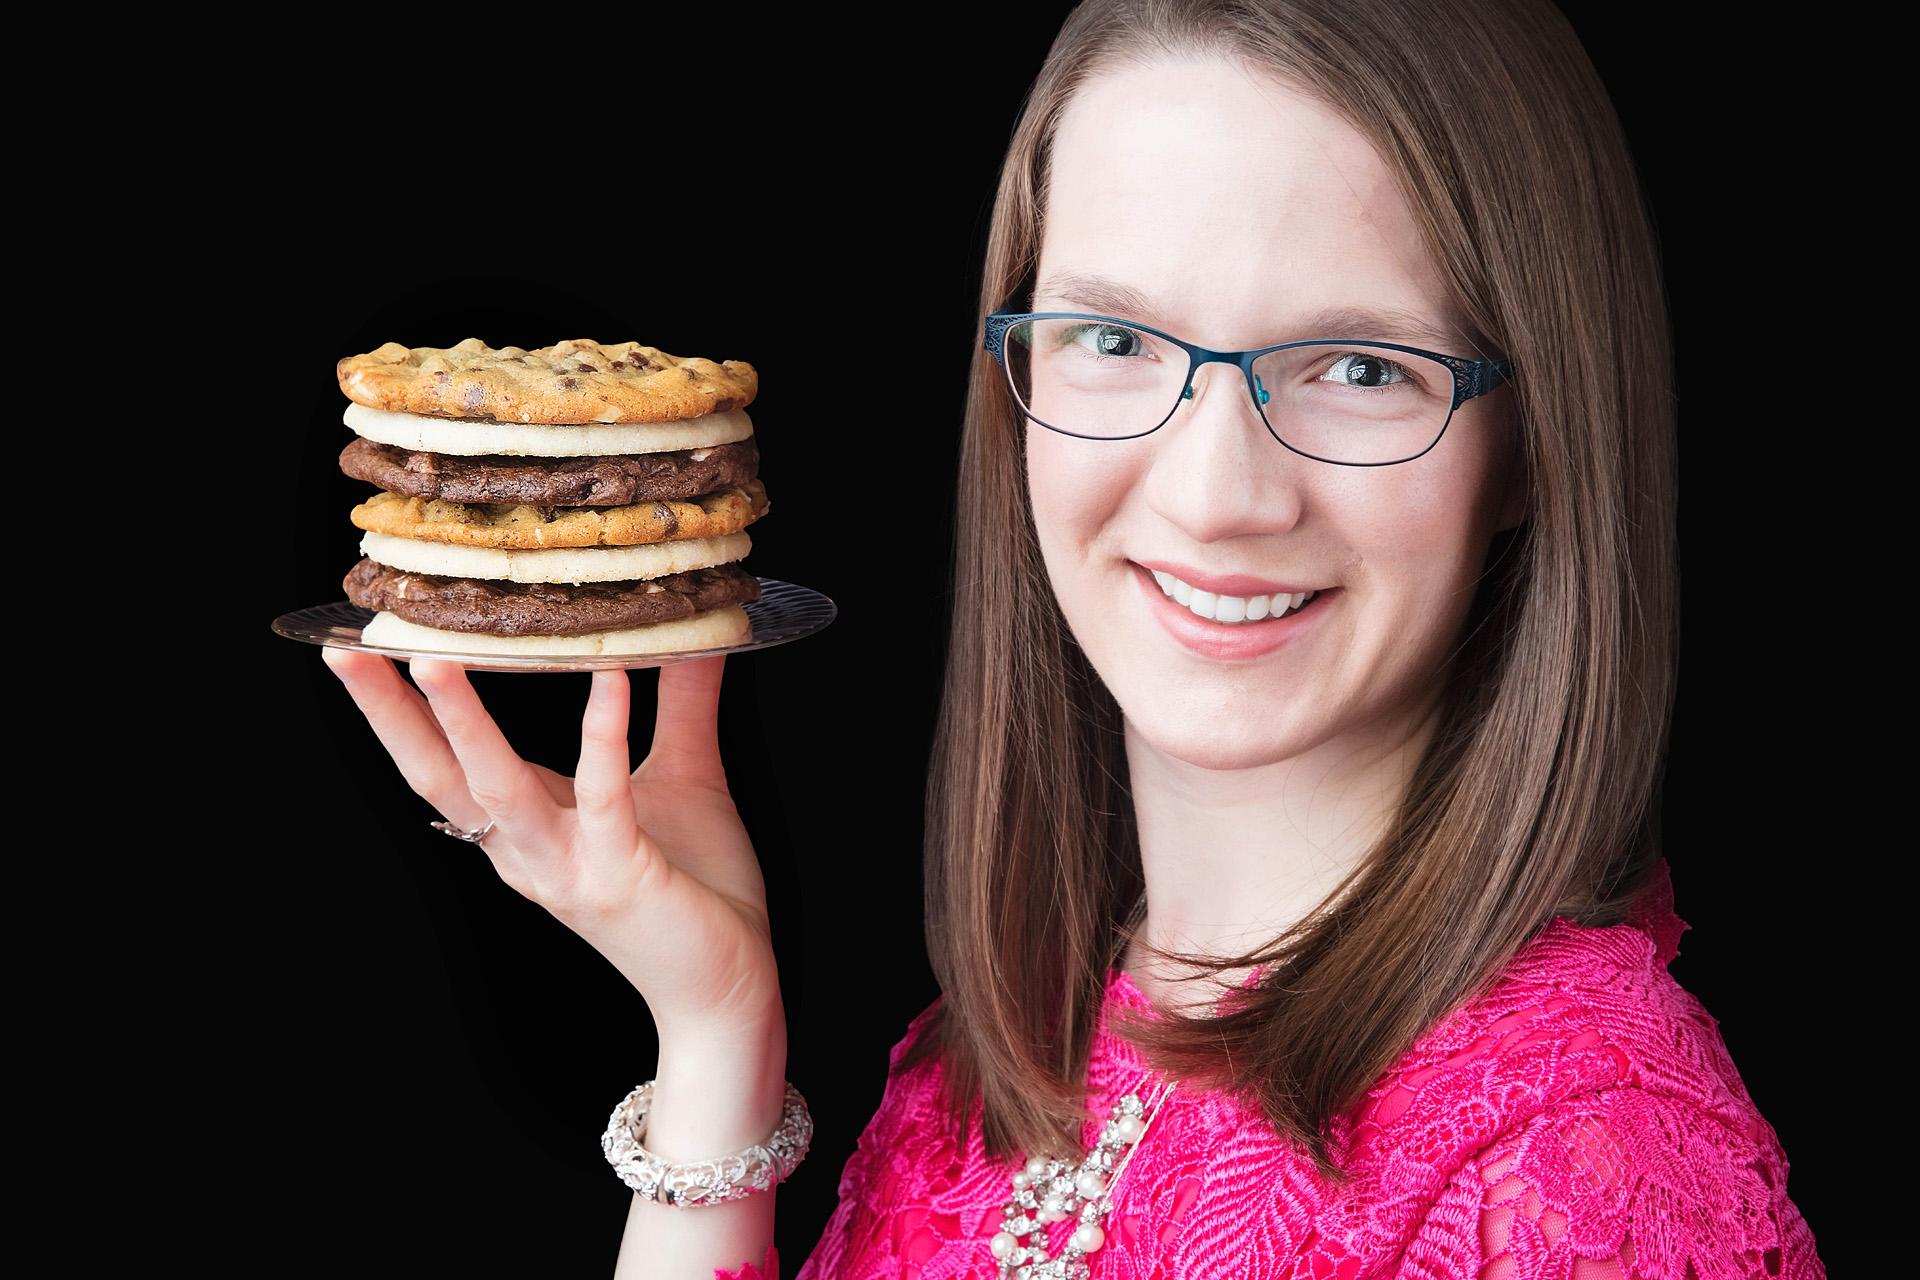 Laura-Christine-3342 cookies at The Johnson Strings smaller.jpg